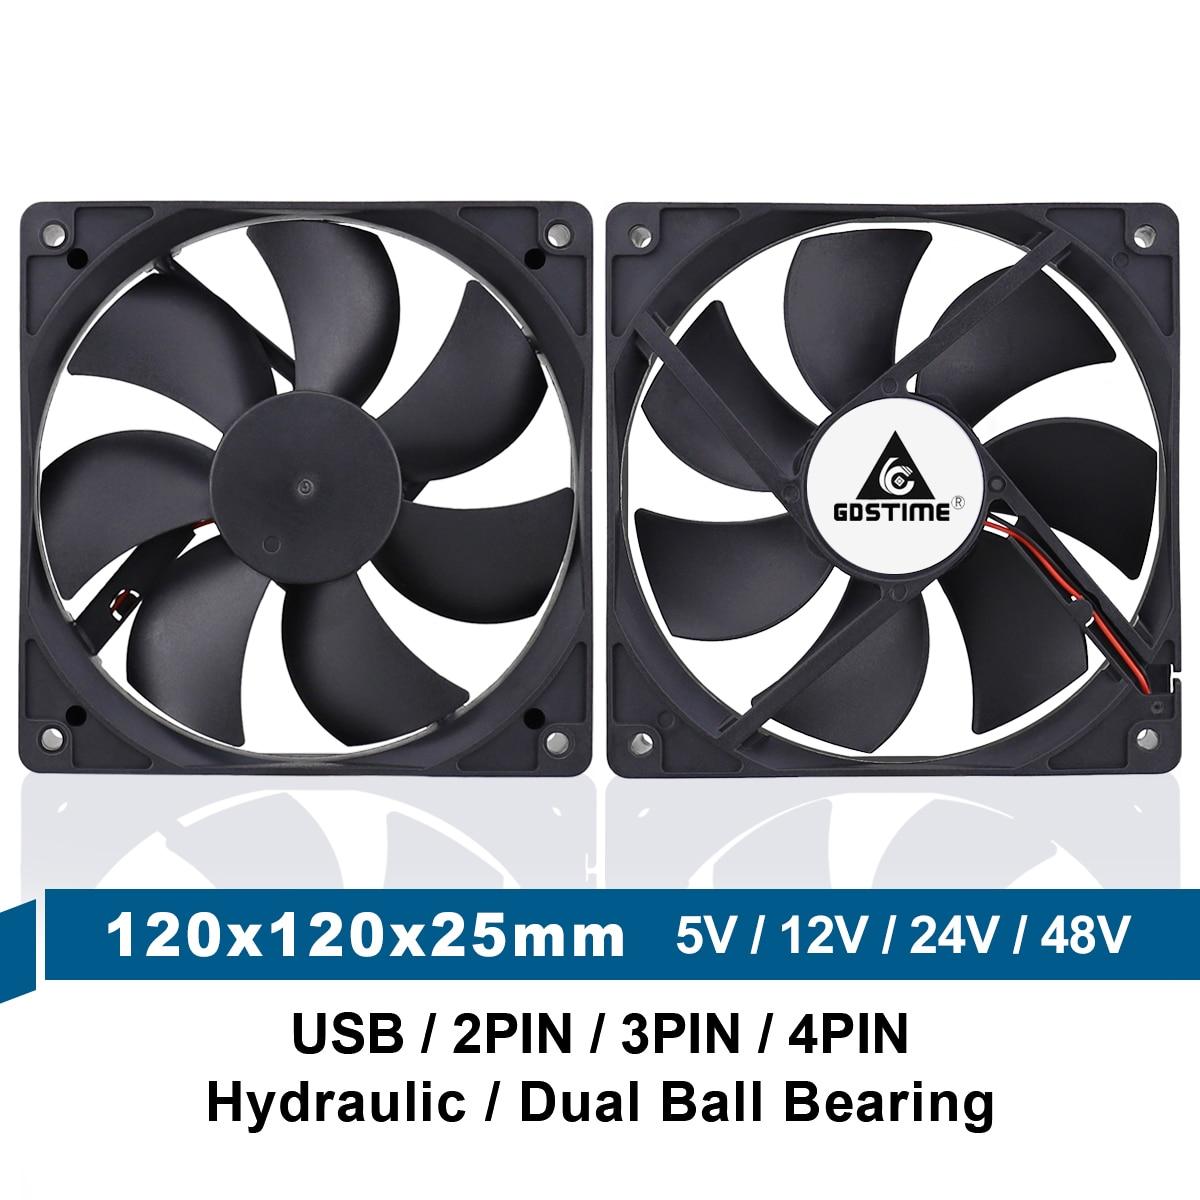 5V 12V 24V 48V 120mm 12025 Sleeve/Ball Cooling Fan 120x120x25mm FG PWM USB 2PIN 3PIN 4PIN DC Cooler Fan for PC Computer Case